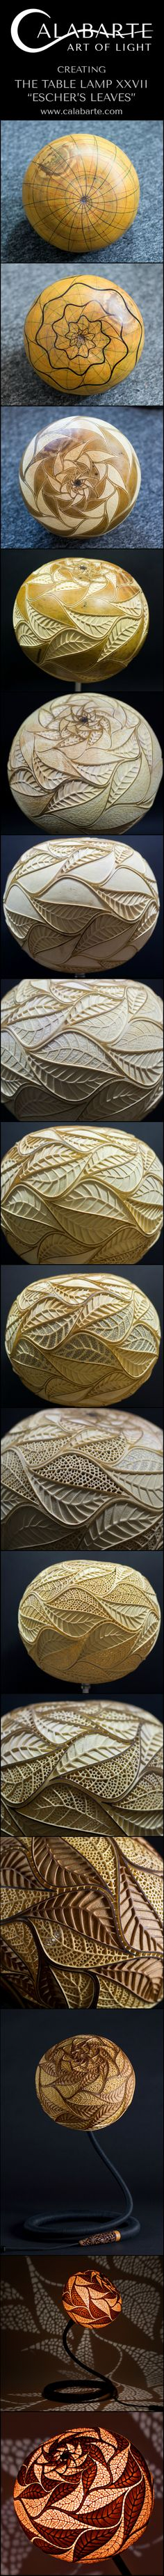 "How gourd became the piece of art. Shots from the process of making the one of a kind table lamp ""Escher's Leaves"" by Calabarte. ___________ #calabarte #mcescher #escher #gourdlamp #tablelamp #lampdesign #workinprogress #spiraldesign #geometry #geometricaldesign #leaves #leavesdesign"